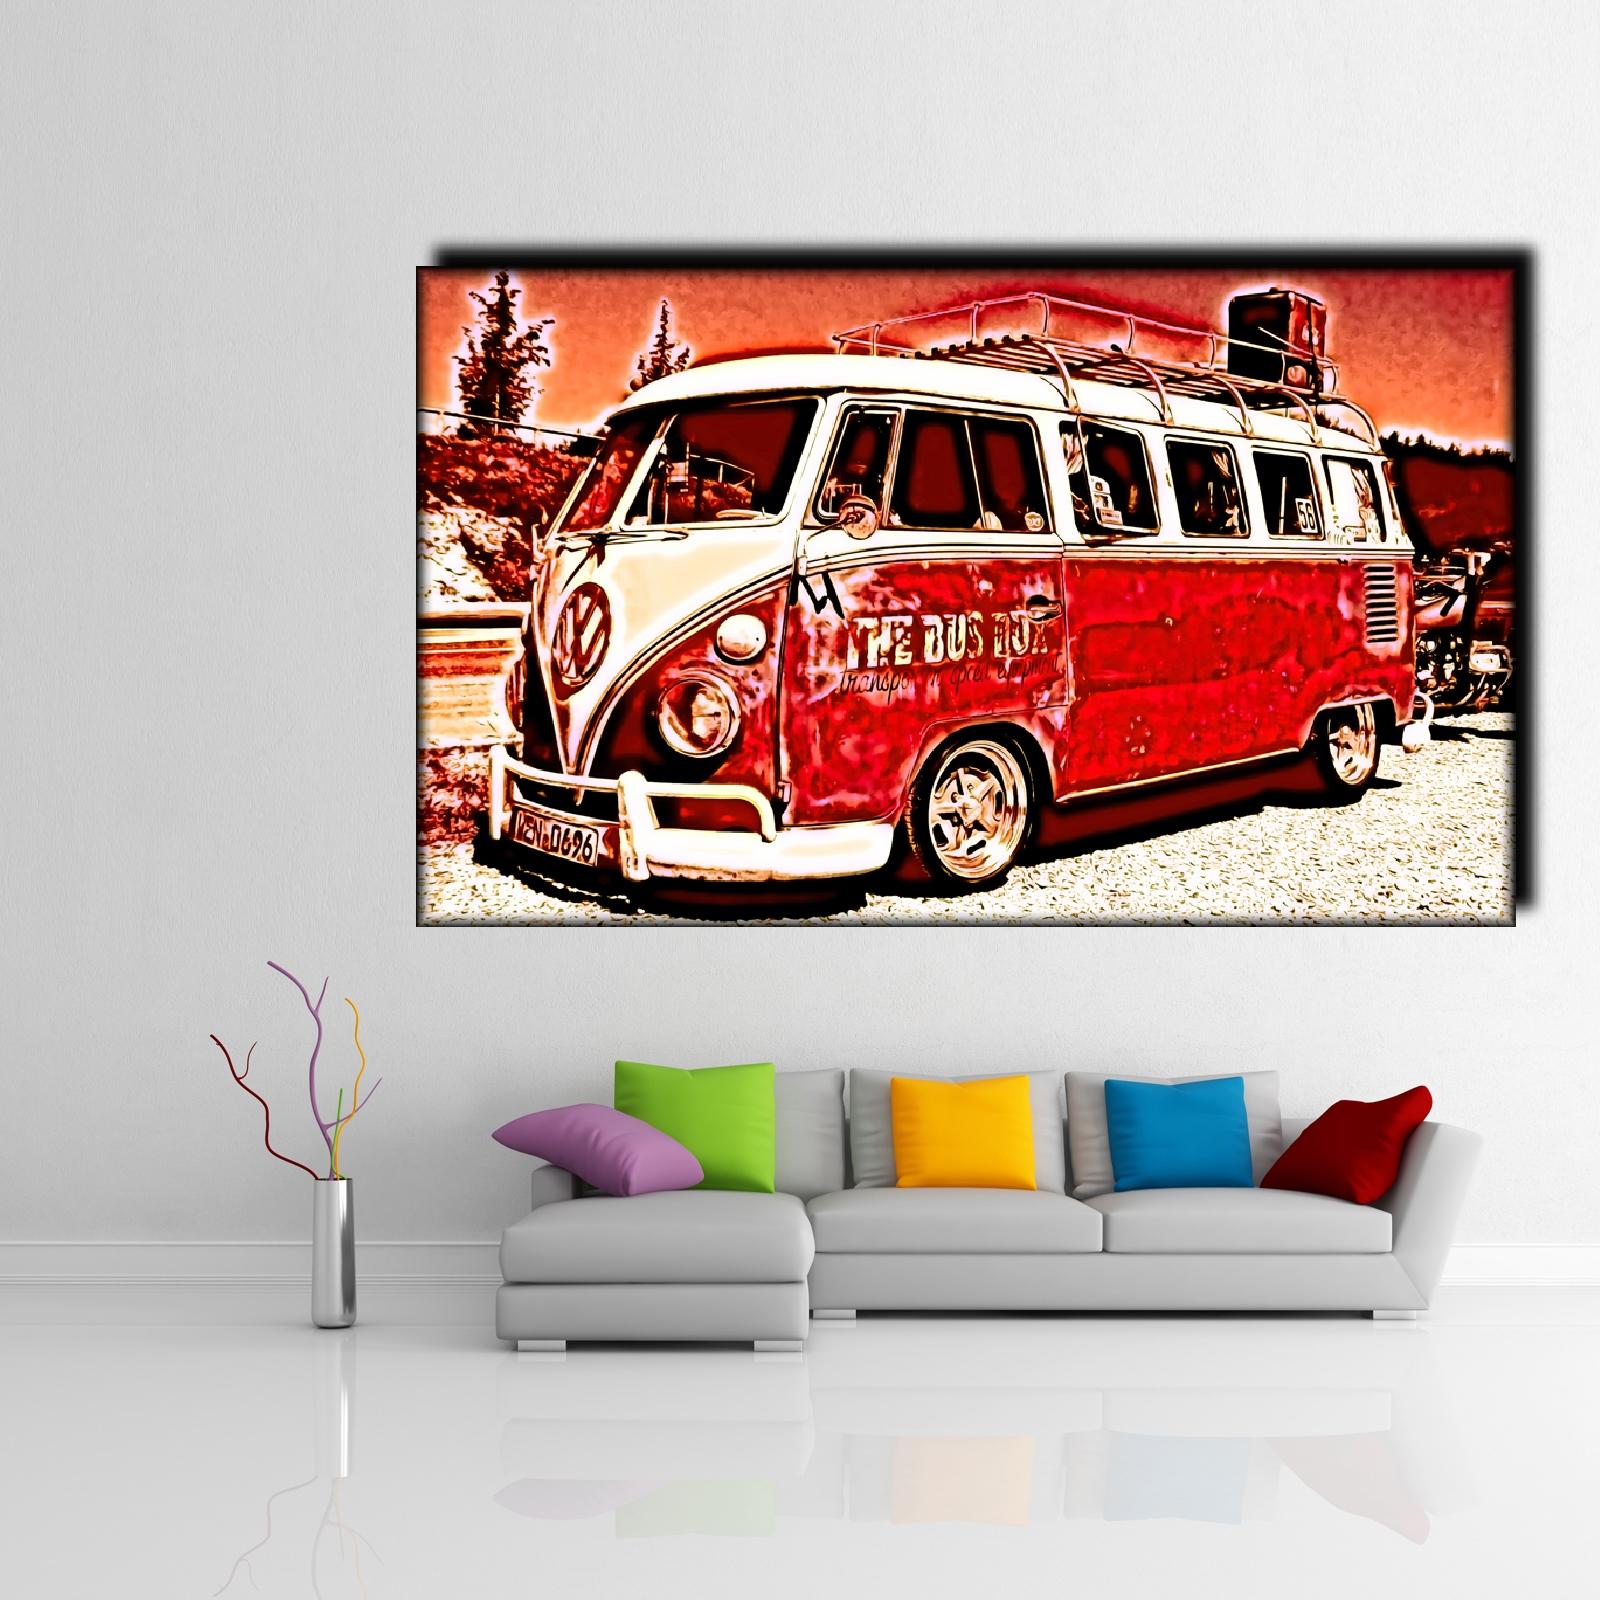 Bild auf Leinwand Bulli Bus V3 1K Leinwandbild Wandbild Poster